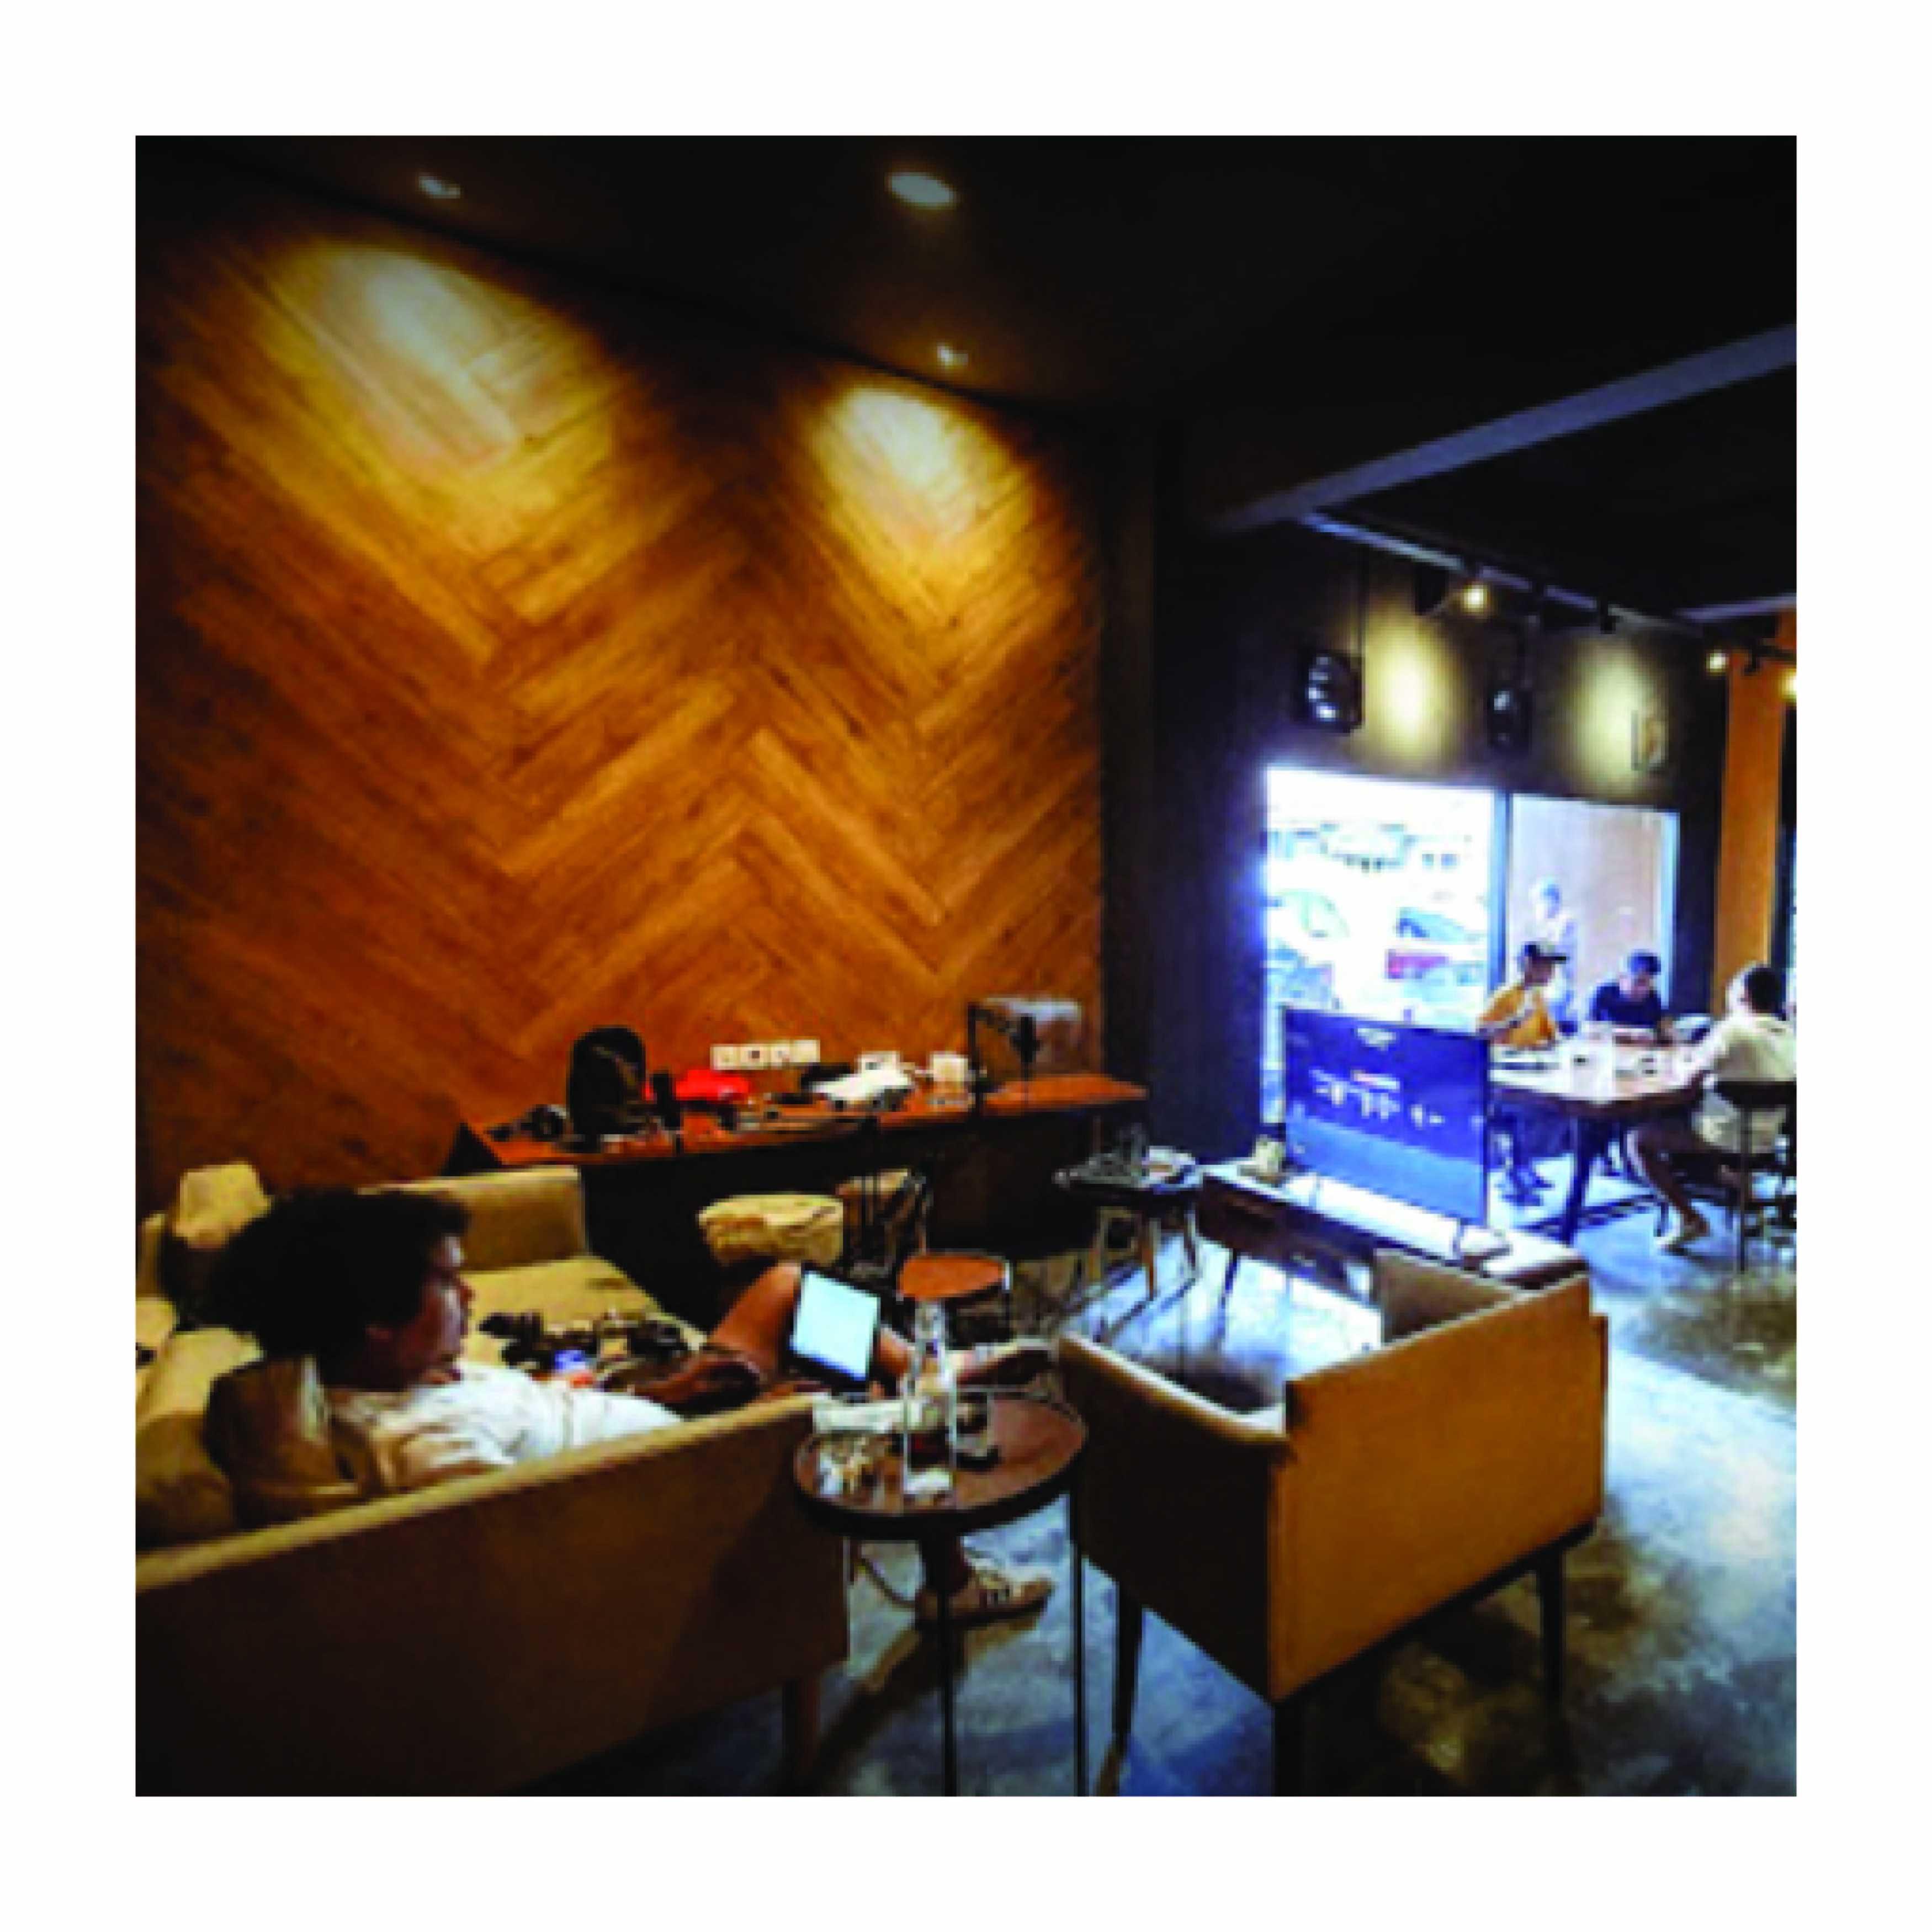 Sepetak Nata Studio Goat Coffee Roaster 11, Jl. Benda No.10, Rt.11/rw.4, Cilandak Tim., Kec. Ps. Minggu, Kota Jakarta Selatan, Daerah Khusus Ibukota Jakarta 12560, Indonesia 11, Jl. Benda No.10, Rt.11/rw.4, Cilandak Tim., Kec. Ps. Minggu, Kota Jakarta Selatan, Daerah Khusus Ibukota Jakarta 12560, Indonesia Sepetak-Nata-Studio-Goat-Coffee-Roaster   134097